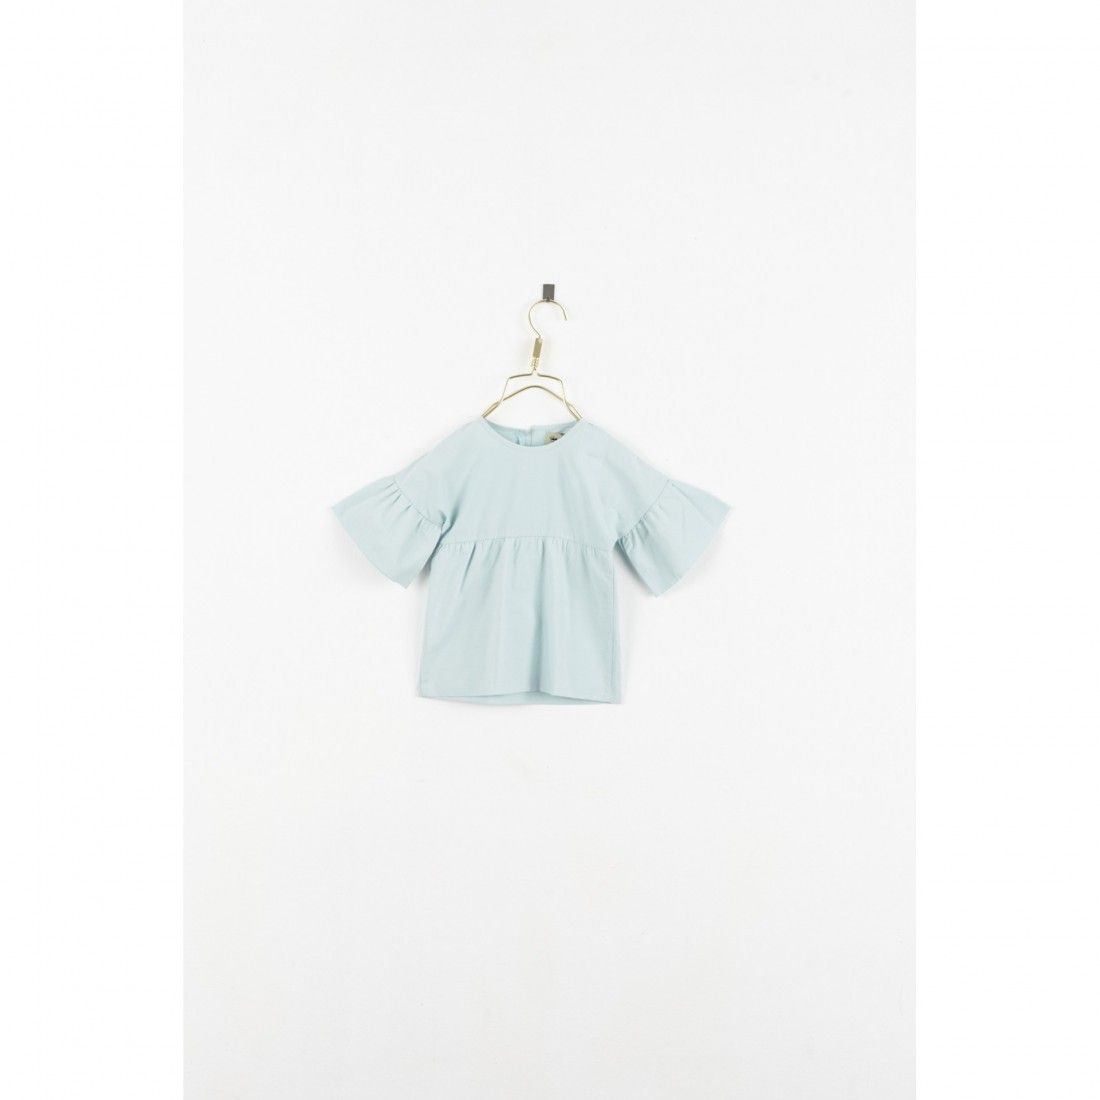 efb628effbf5 Μπλούζα - Bohemian Afternoon | Παιδικα Ρουχα - Vintage | Ruffle ...